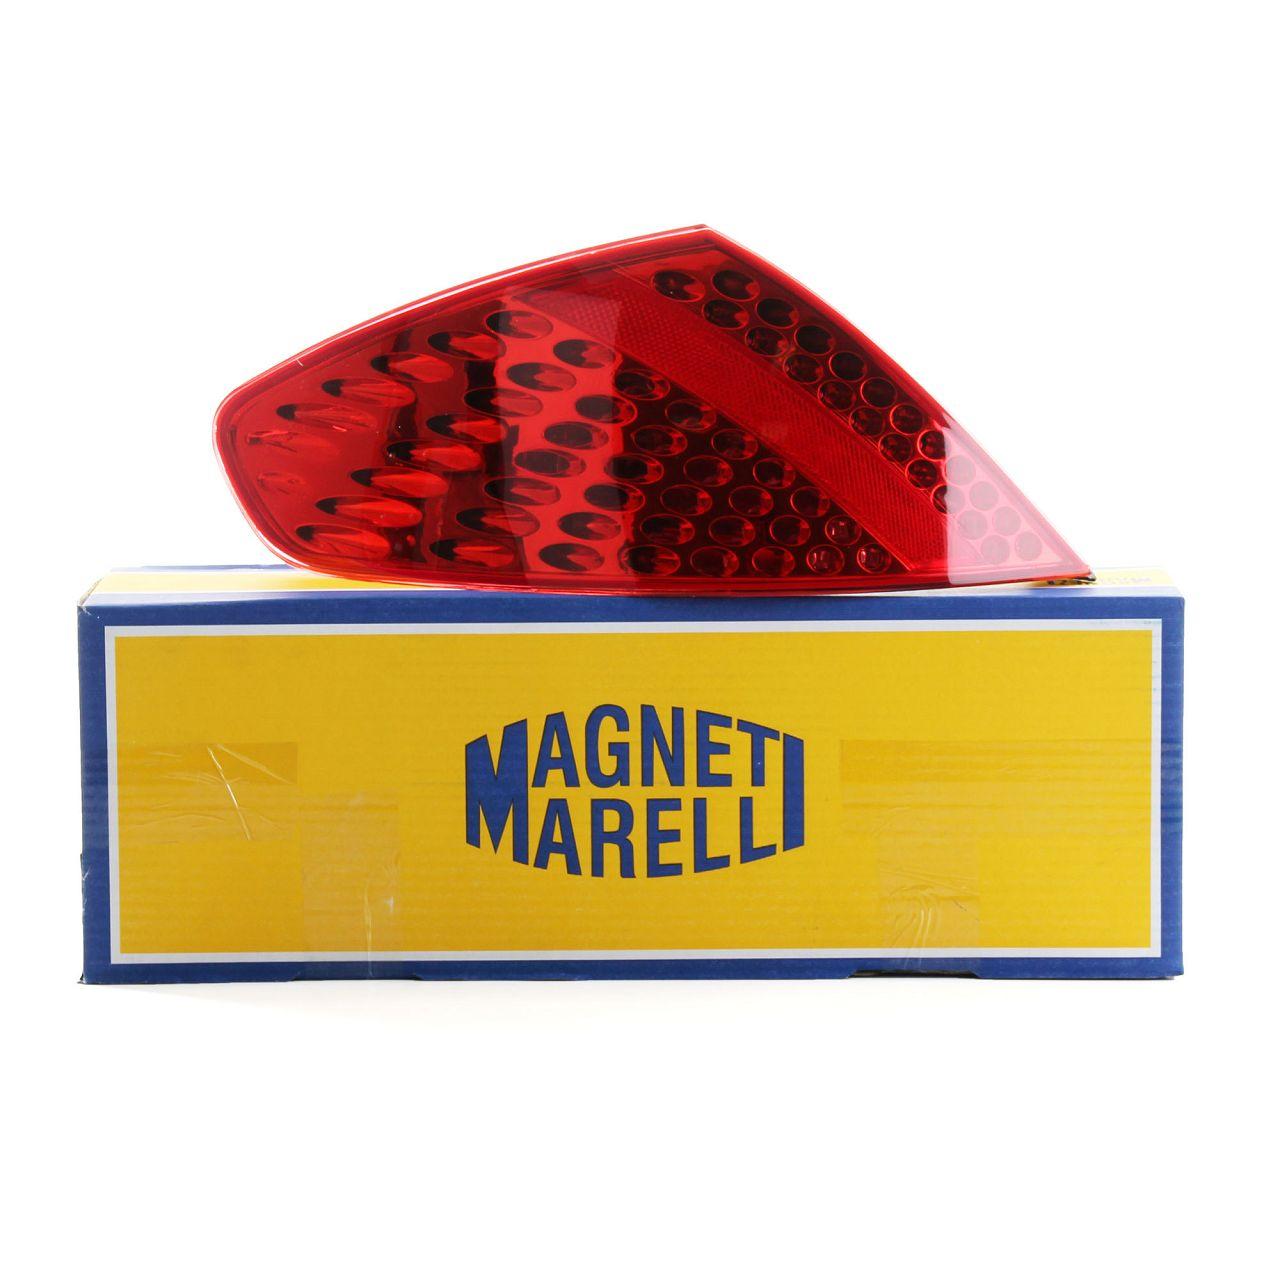 MAGNETI MARELLI Heckleuchte Rückleuchte LED für PEUGEOT 307 CC aussen links